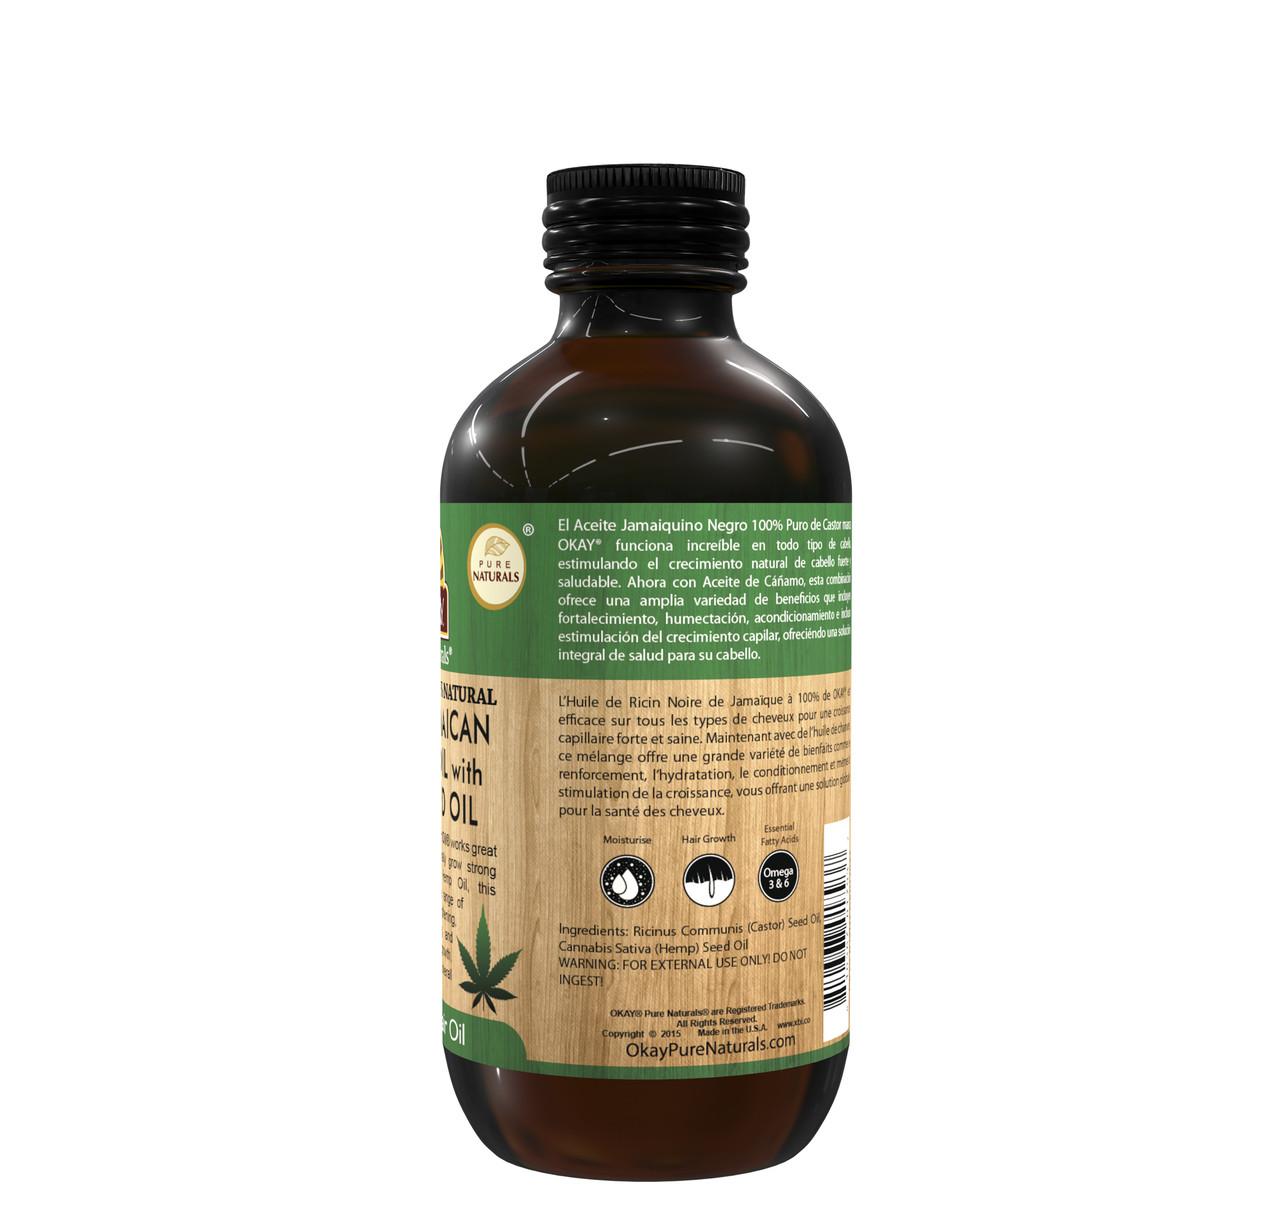 Extra Dark 100 Natural Black Jamaican Castor Oil With Hemp Seed Oil Helps Strengthen Hair